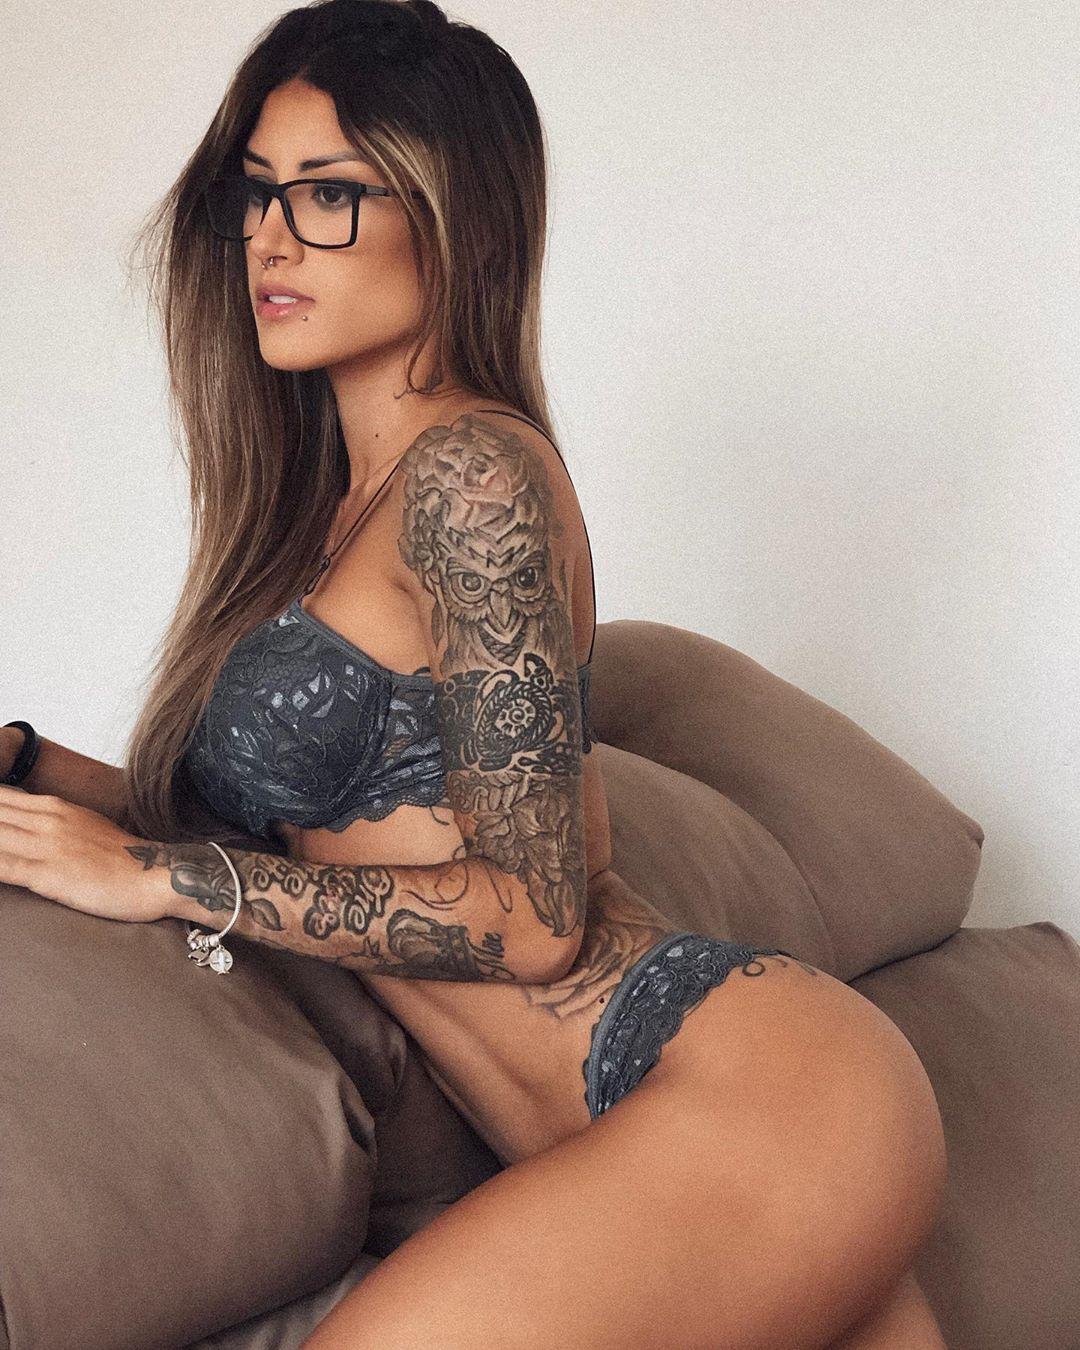 Nathalia Ramonny